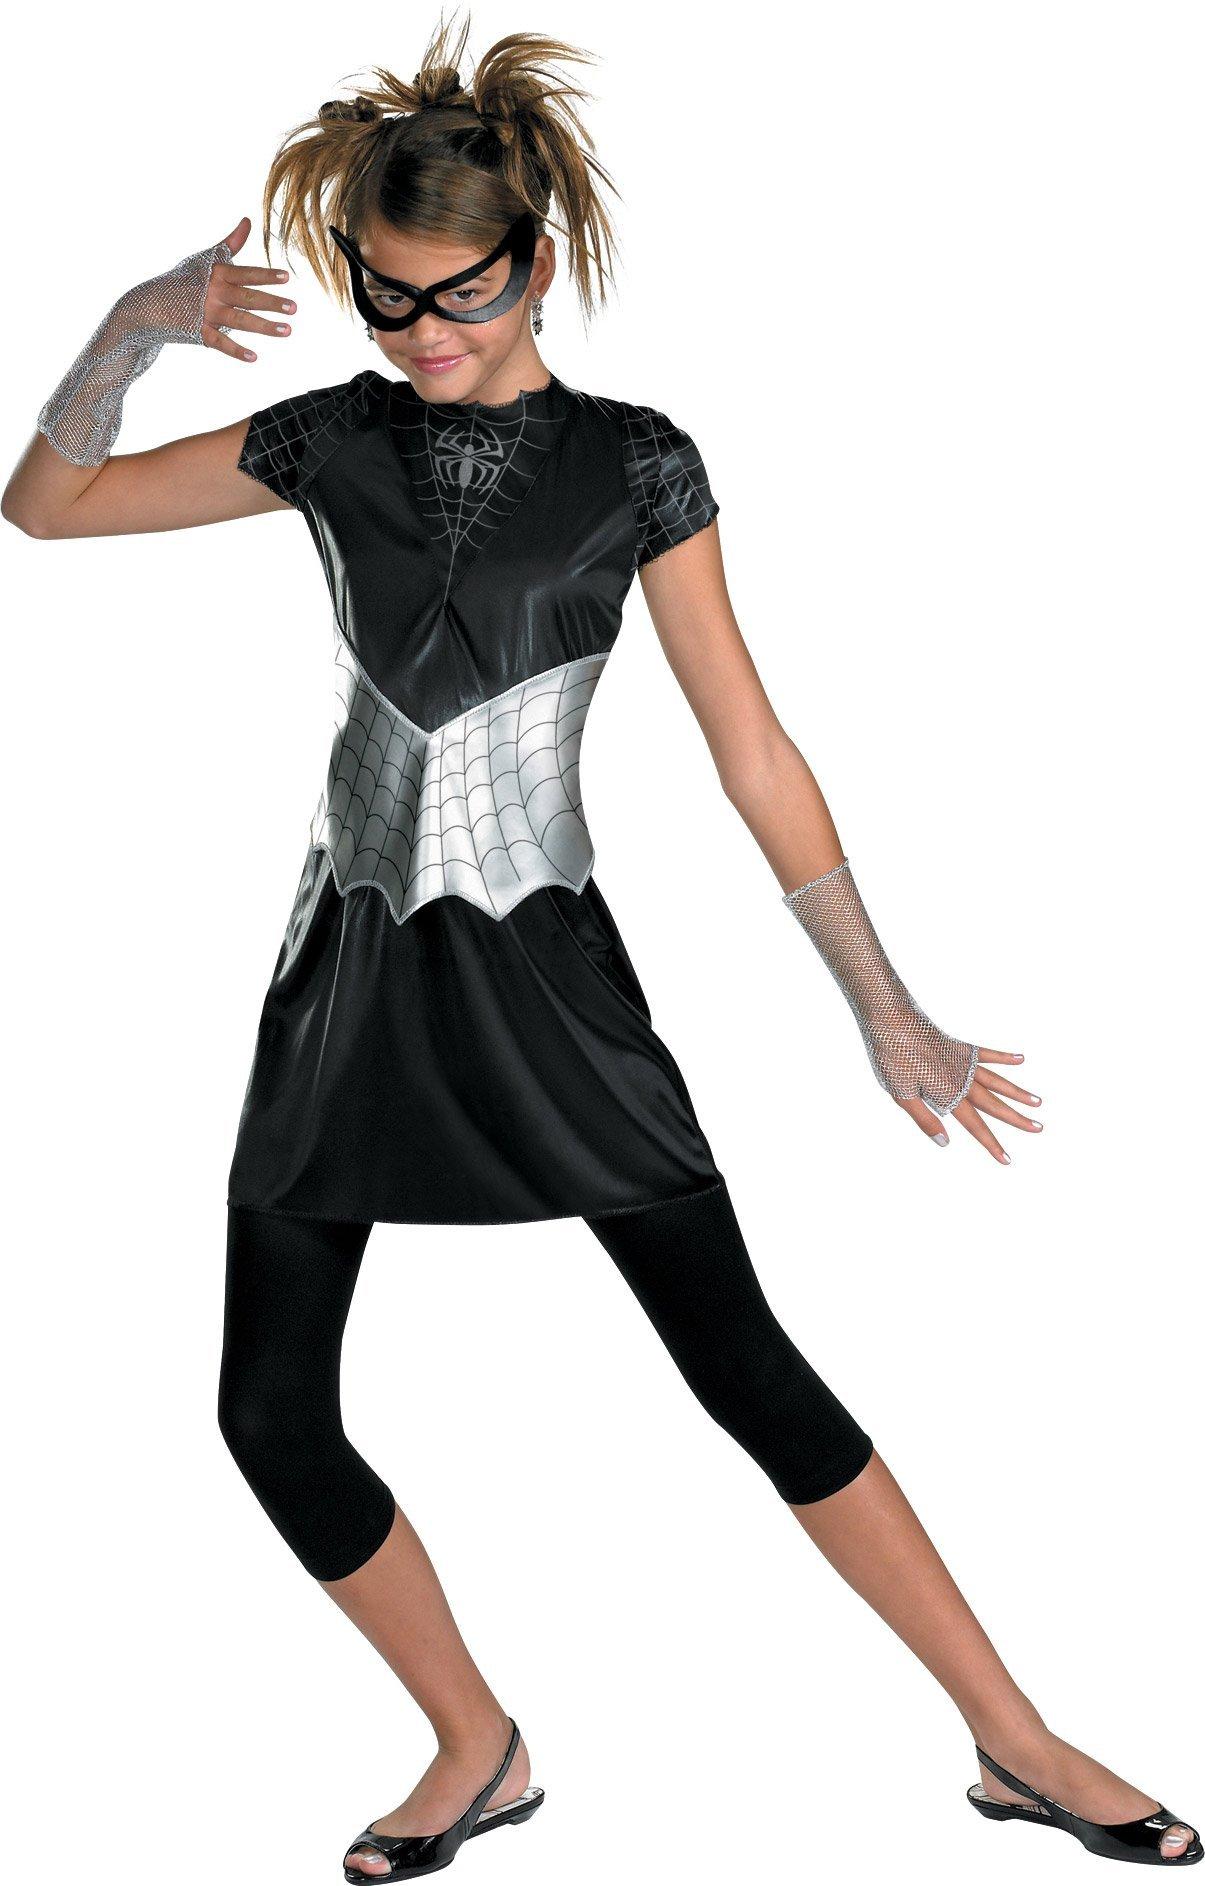 - 717dSYJbobL - BlackSuited SpiderGirl Costume M(78)